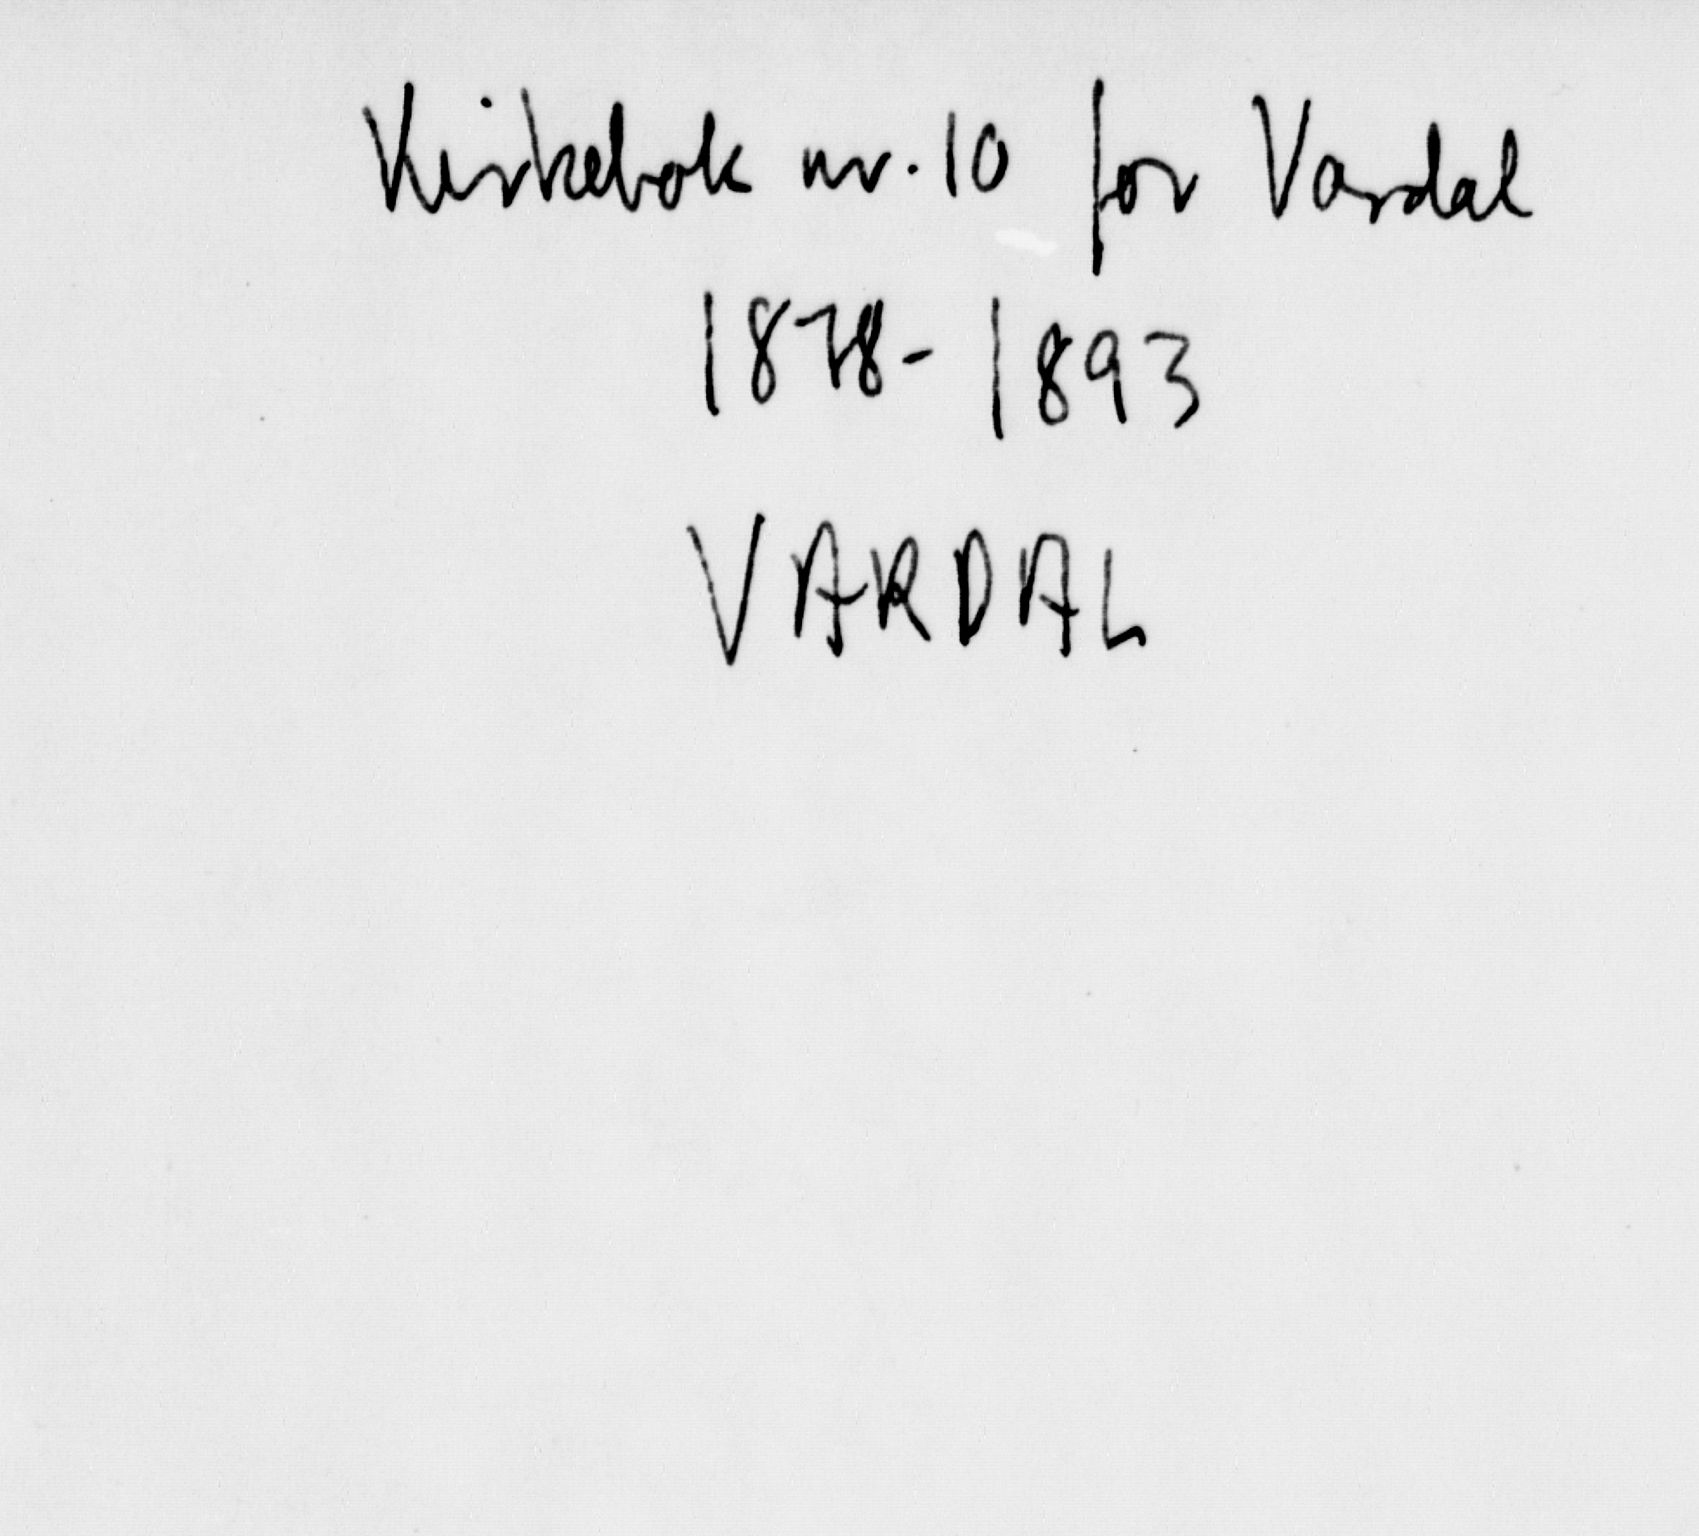 SAH, Vardal prestekontor, H/Ha/Haa/L0010: Ministerialbok nr. 10, 1878-1893